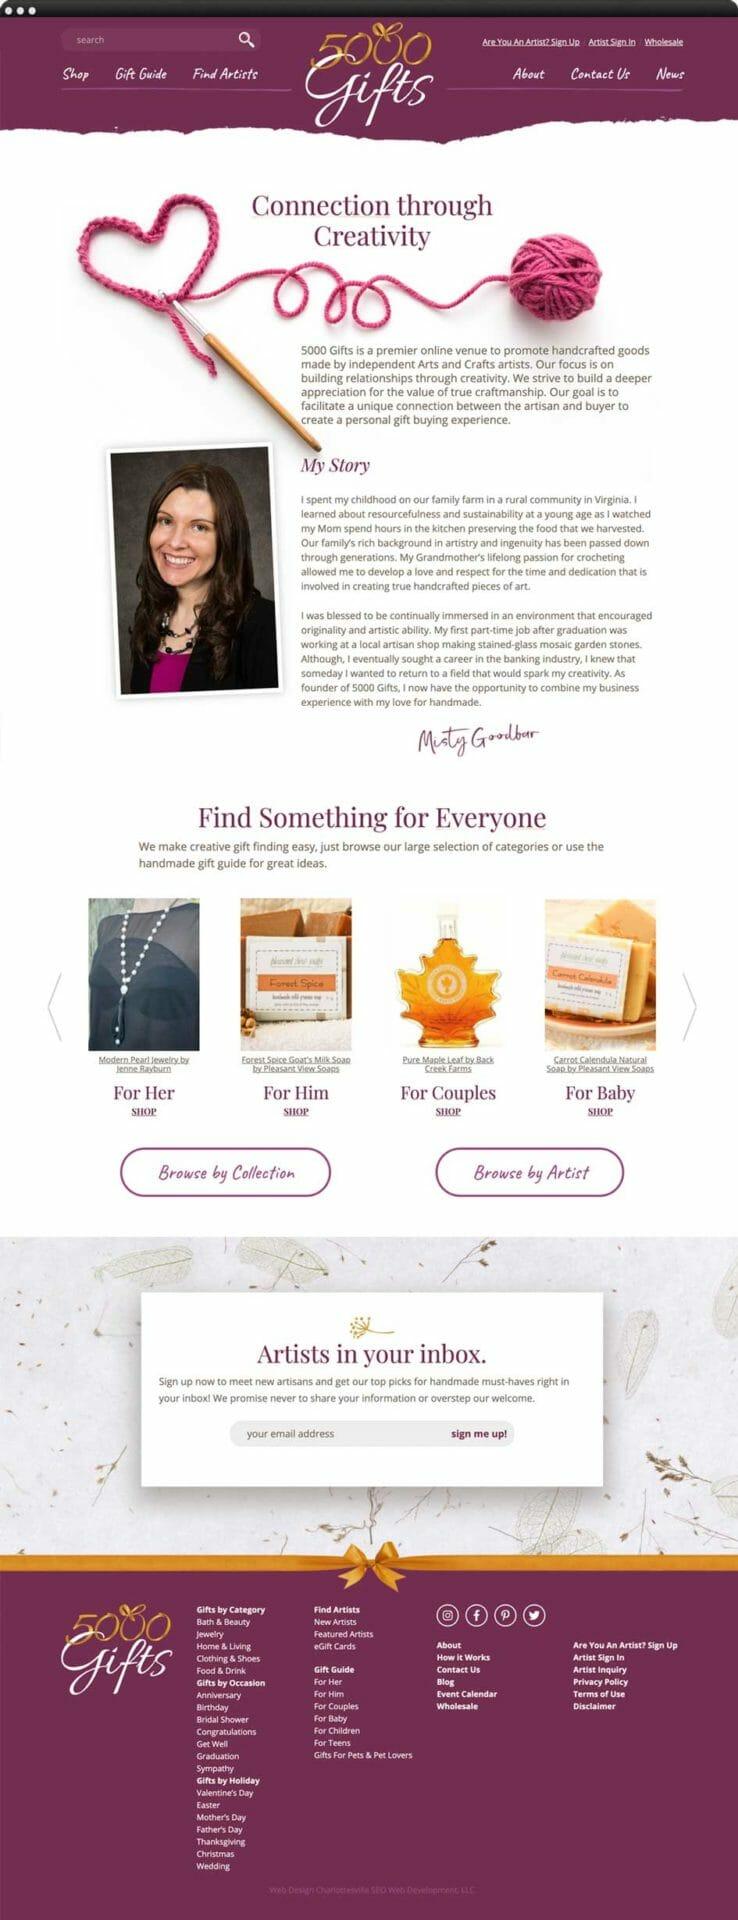 Web design portfolio: 5000 Gifts Website